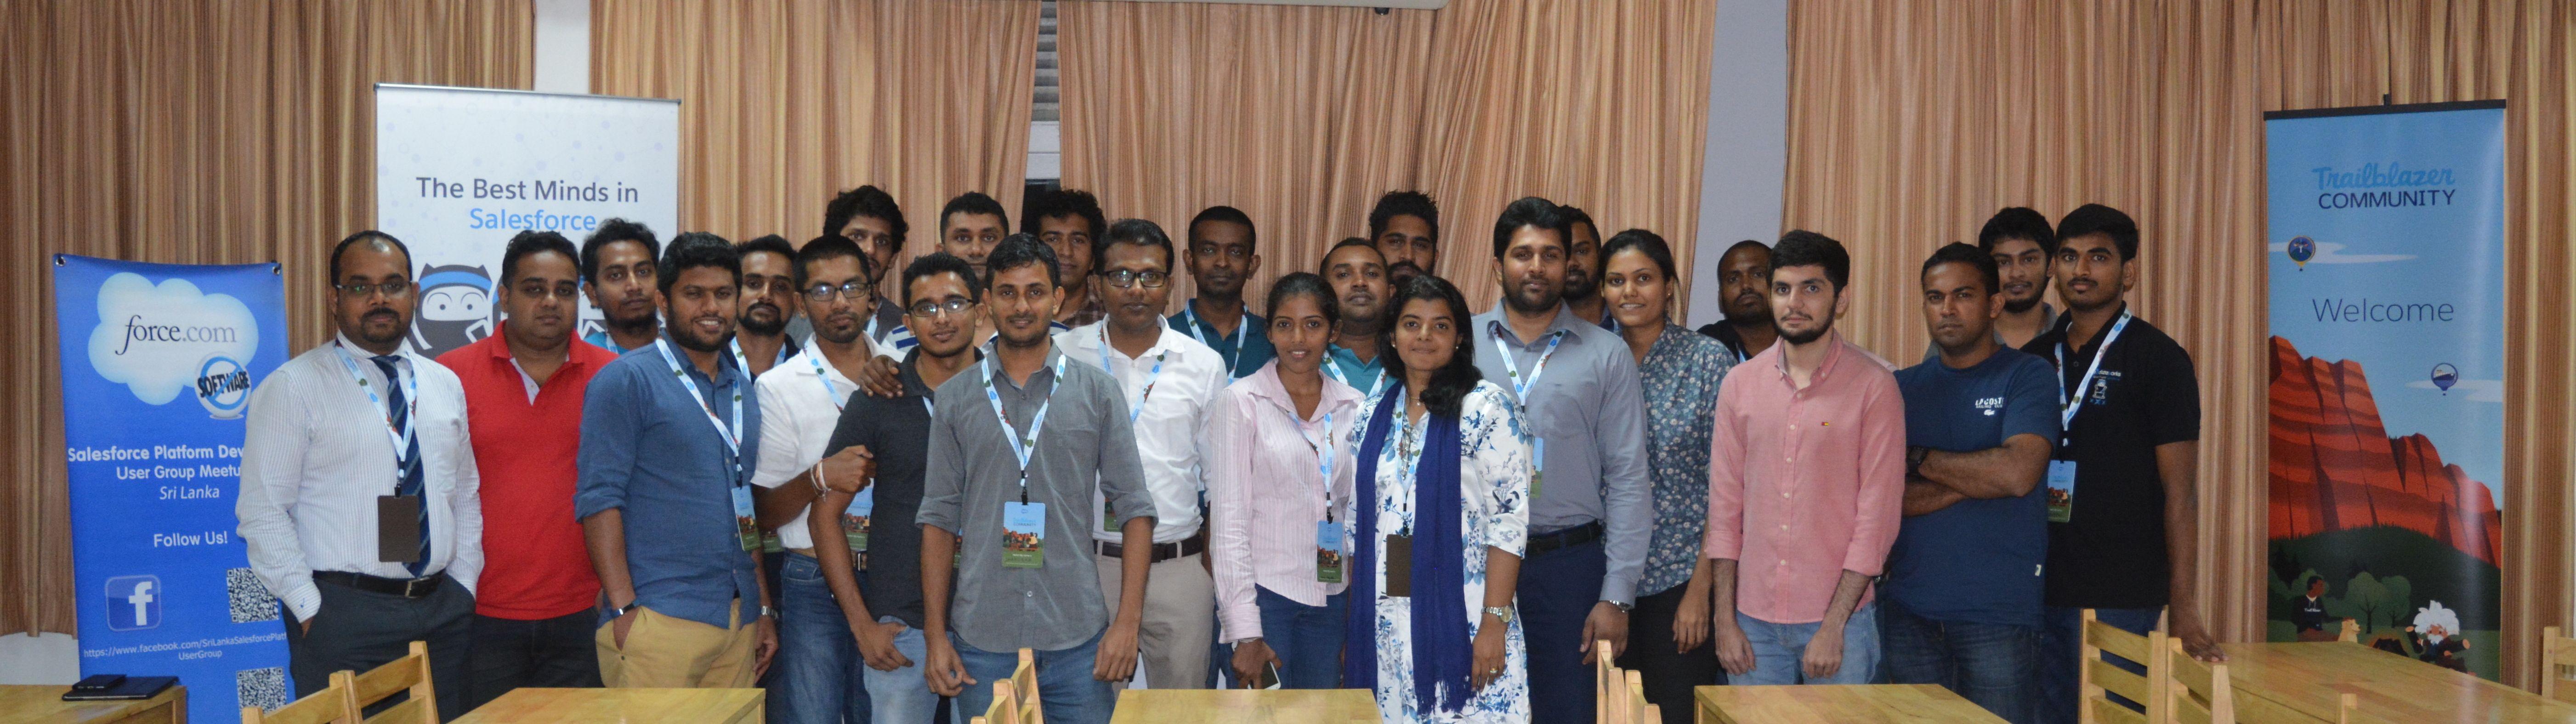 TrailheaDX 2019 Global Gathering - Colombo, Sri Lanka | Meetup